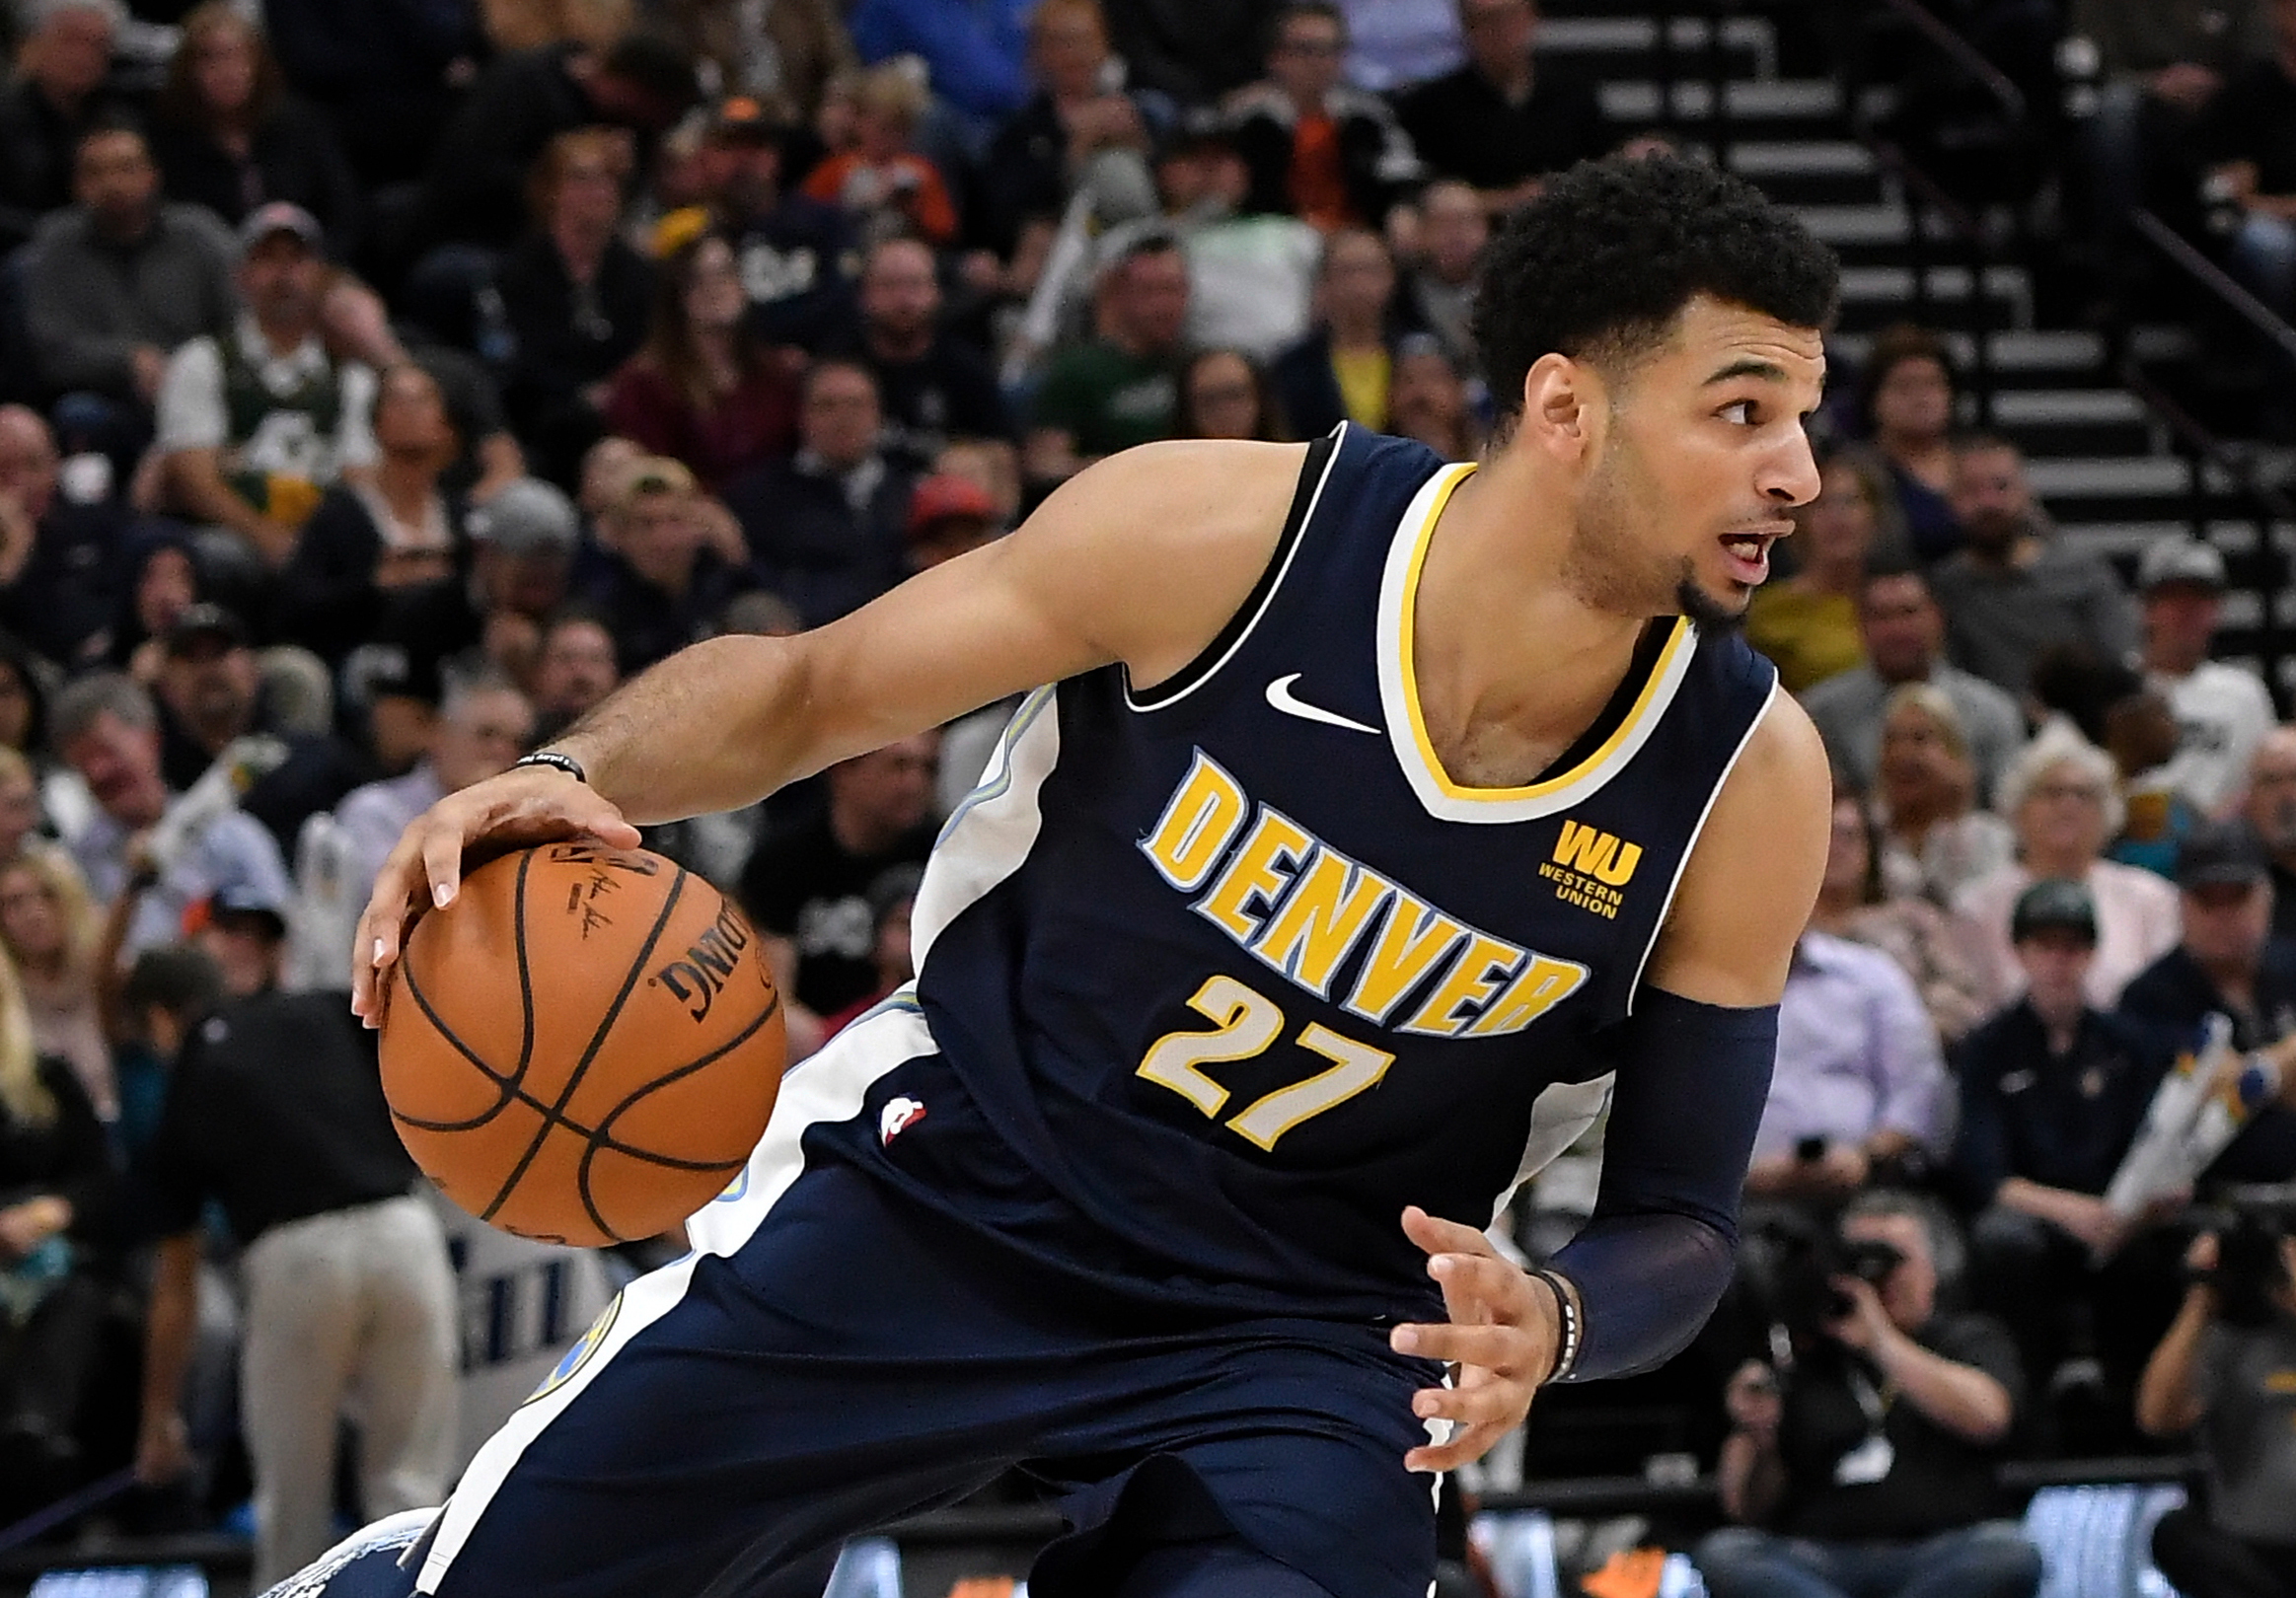 f3ba6262c026 B/R's Top 100 NBA Players Entering the 2018-19 Season | Bleacher Report |  Latest News, Videos and Highlights